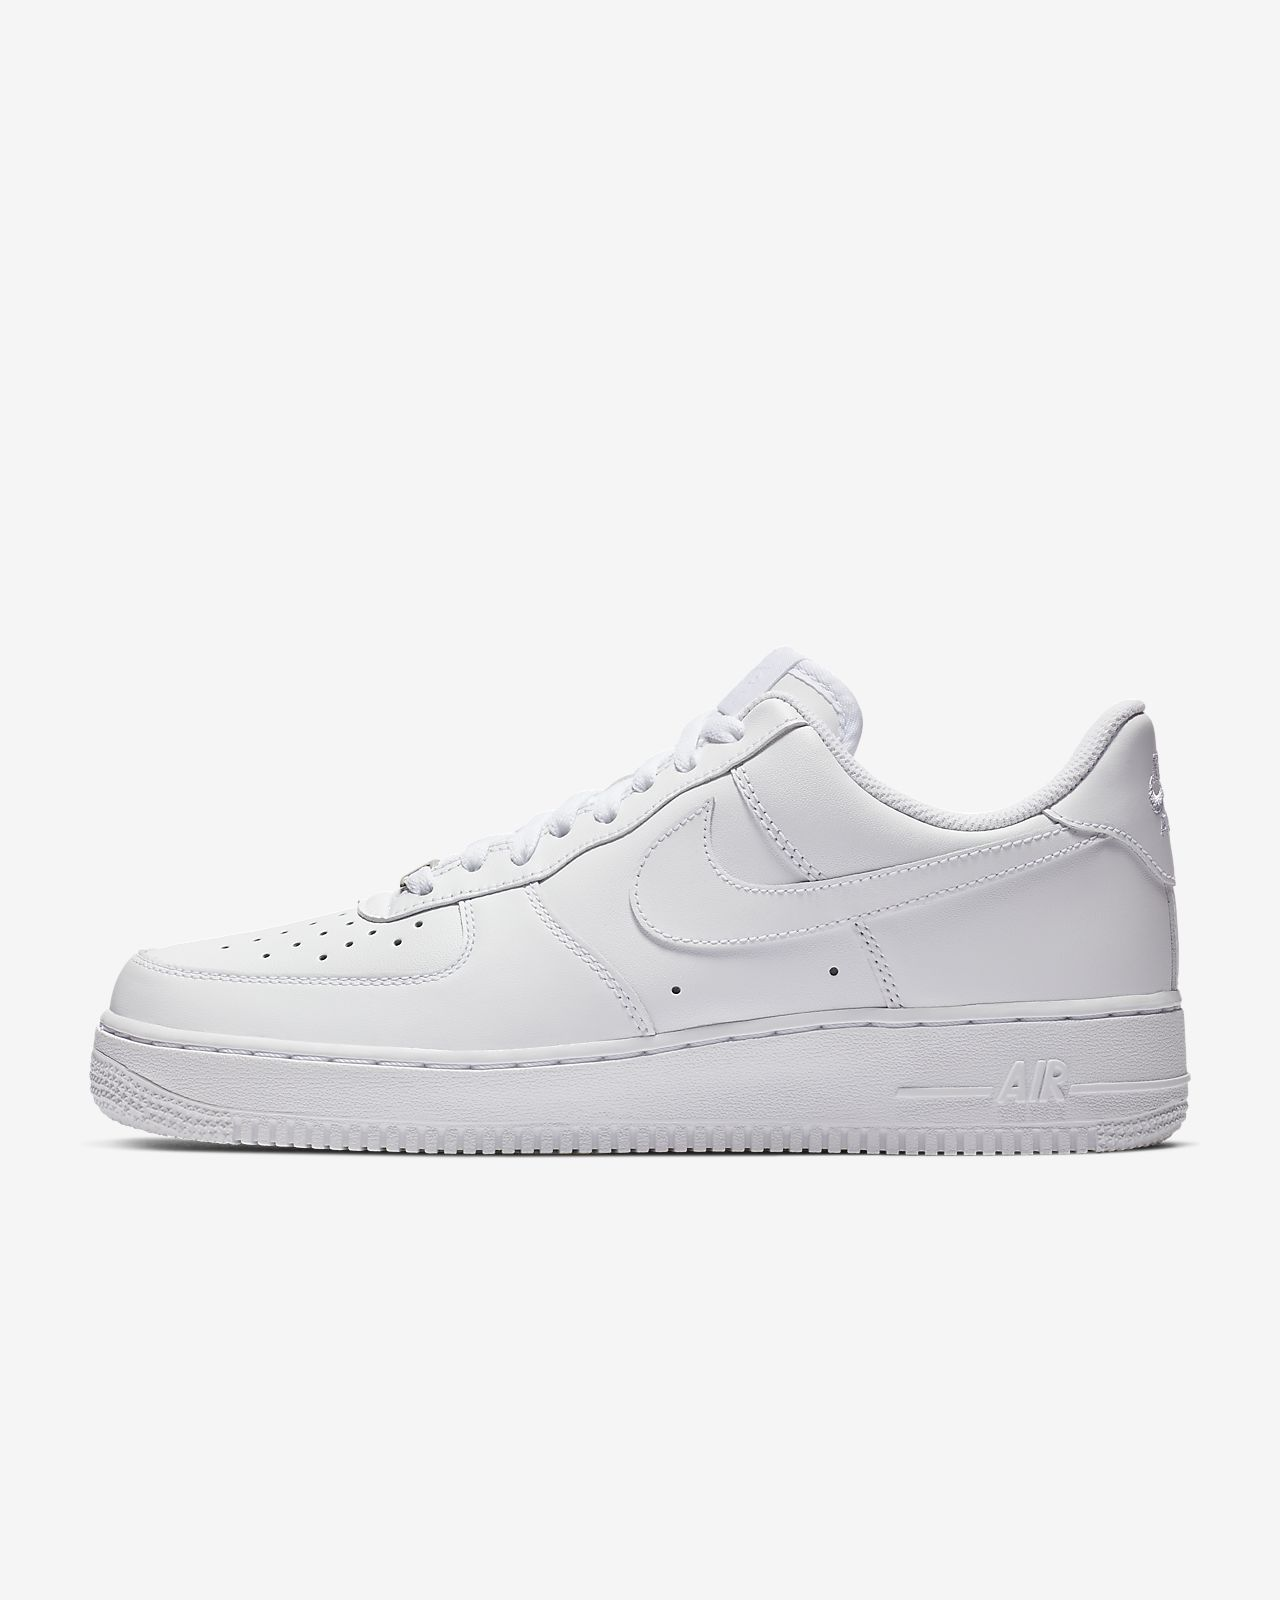 Nike Air Force 1 '07 Women's schoen